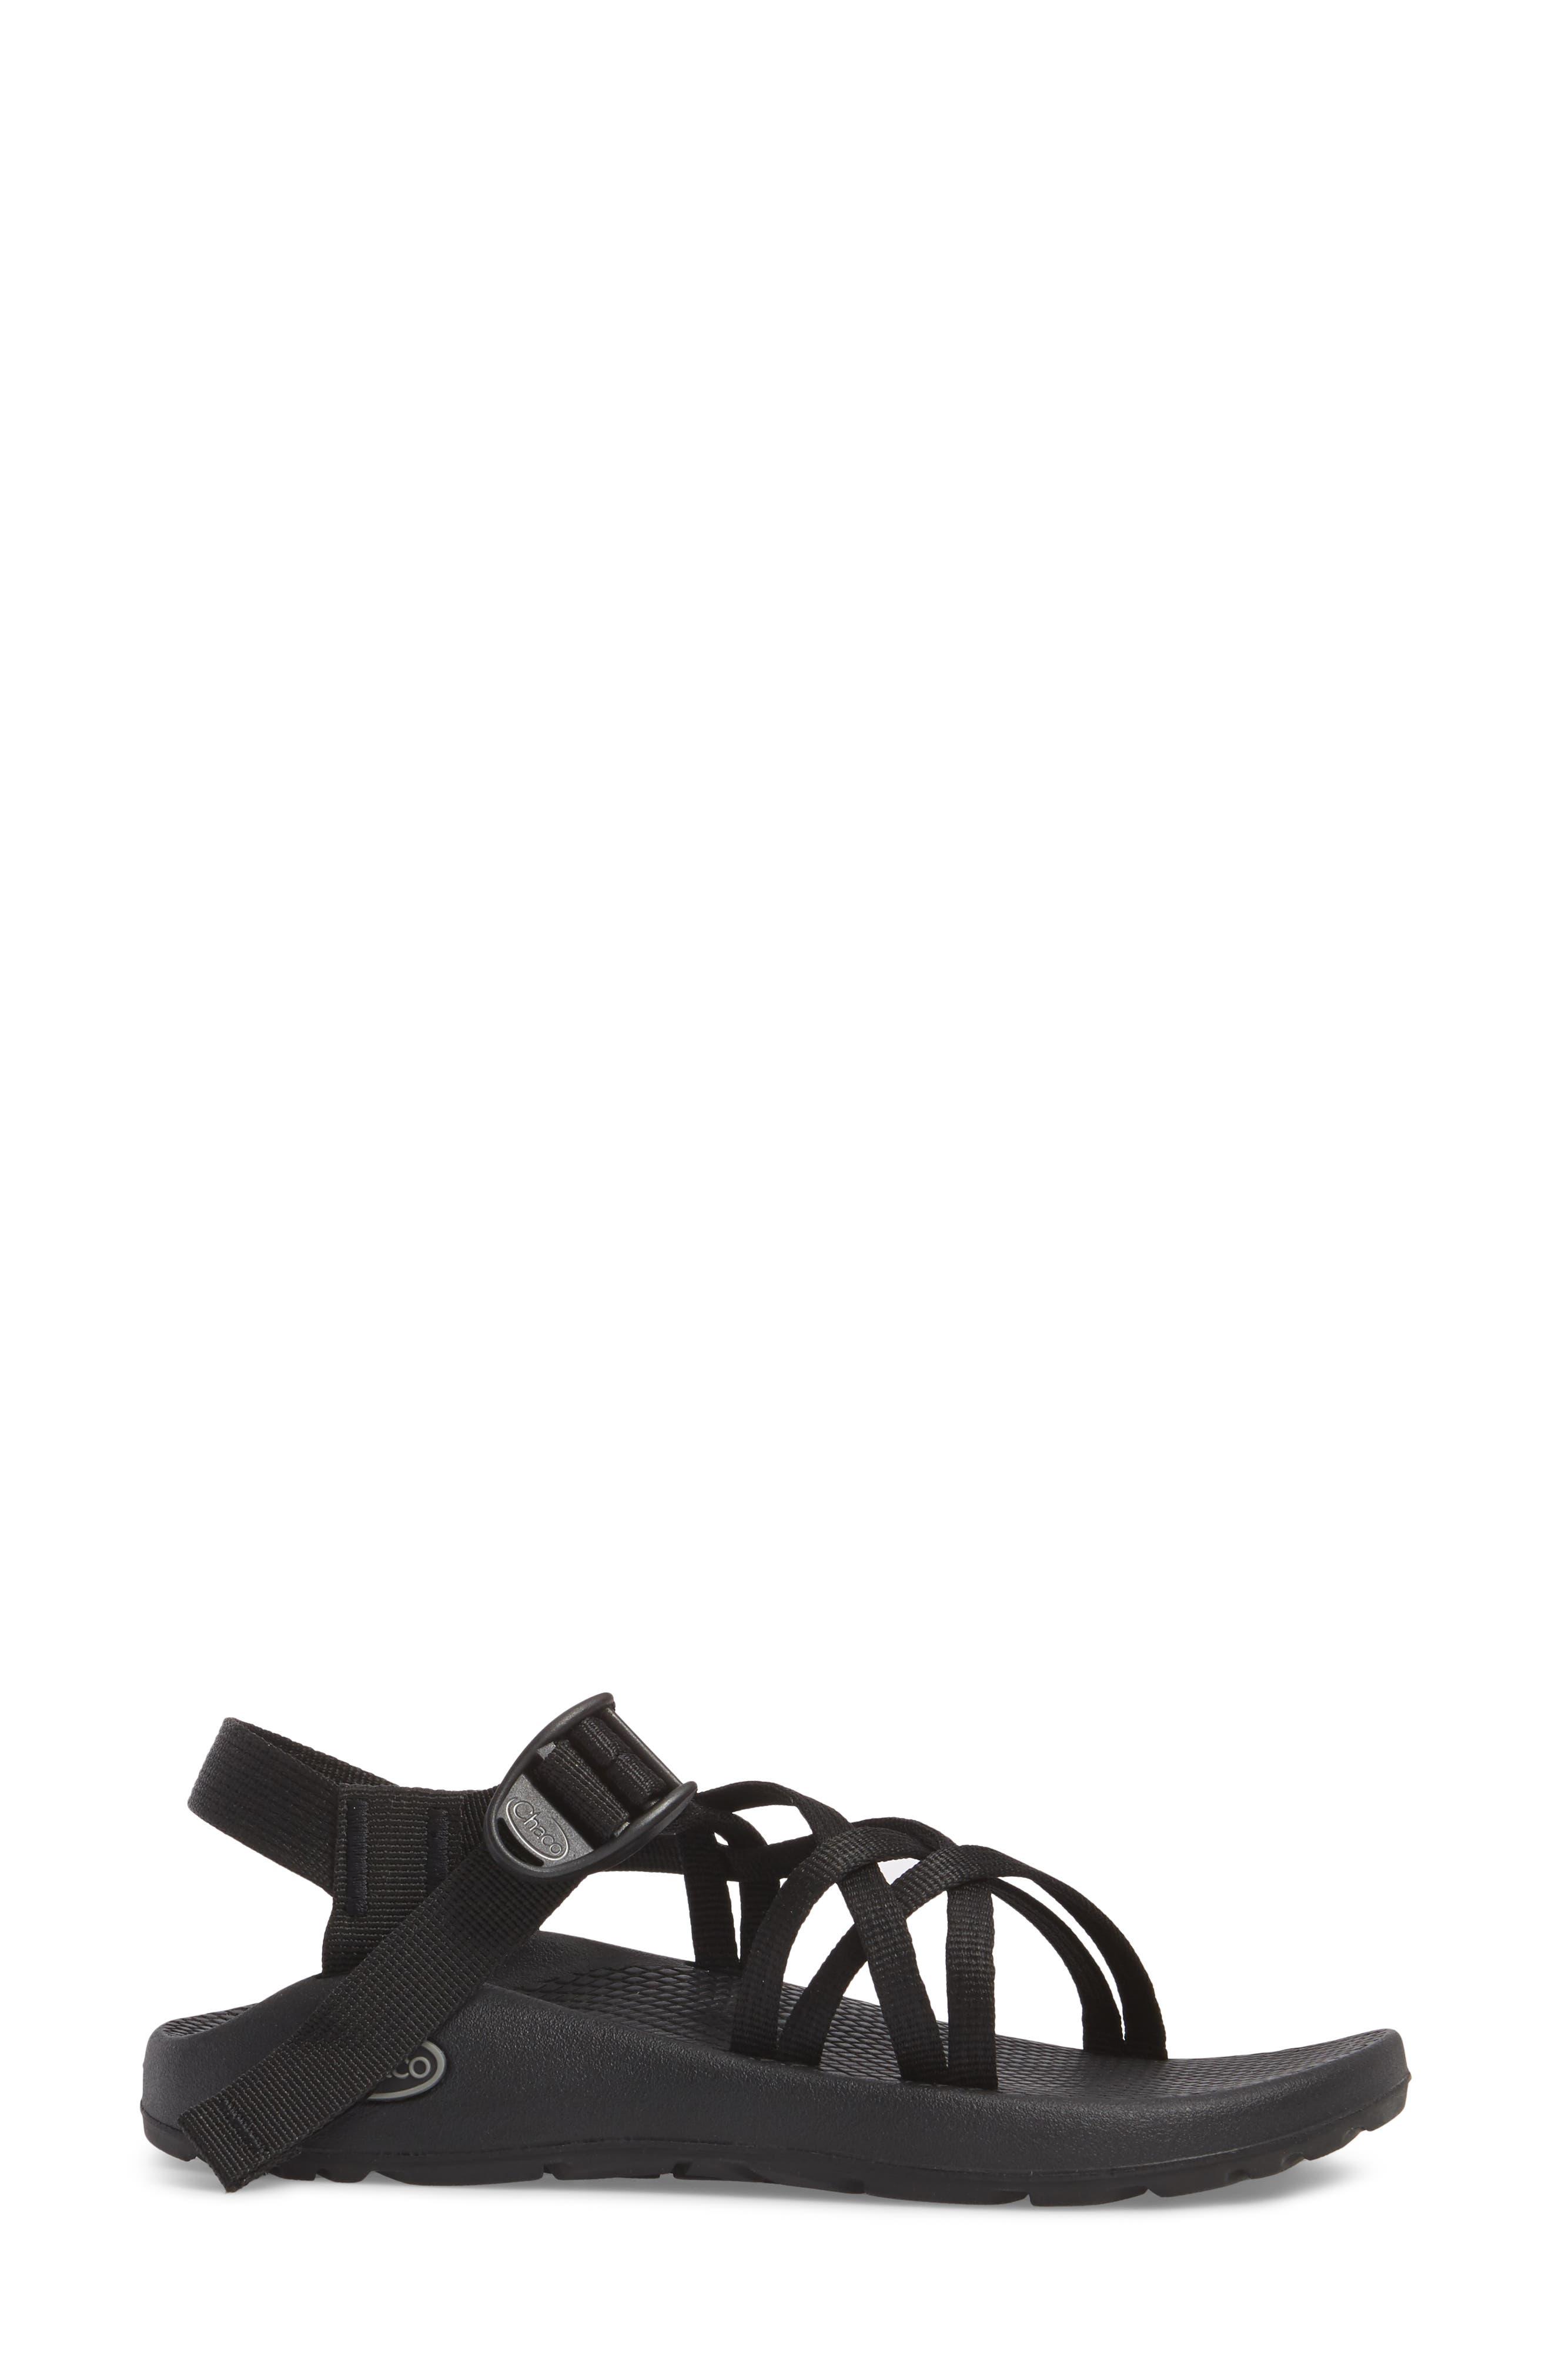 Alternate Image 3  - Chaco ZX1 Classic Sport Sandal (Women)